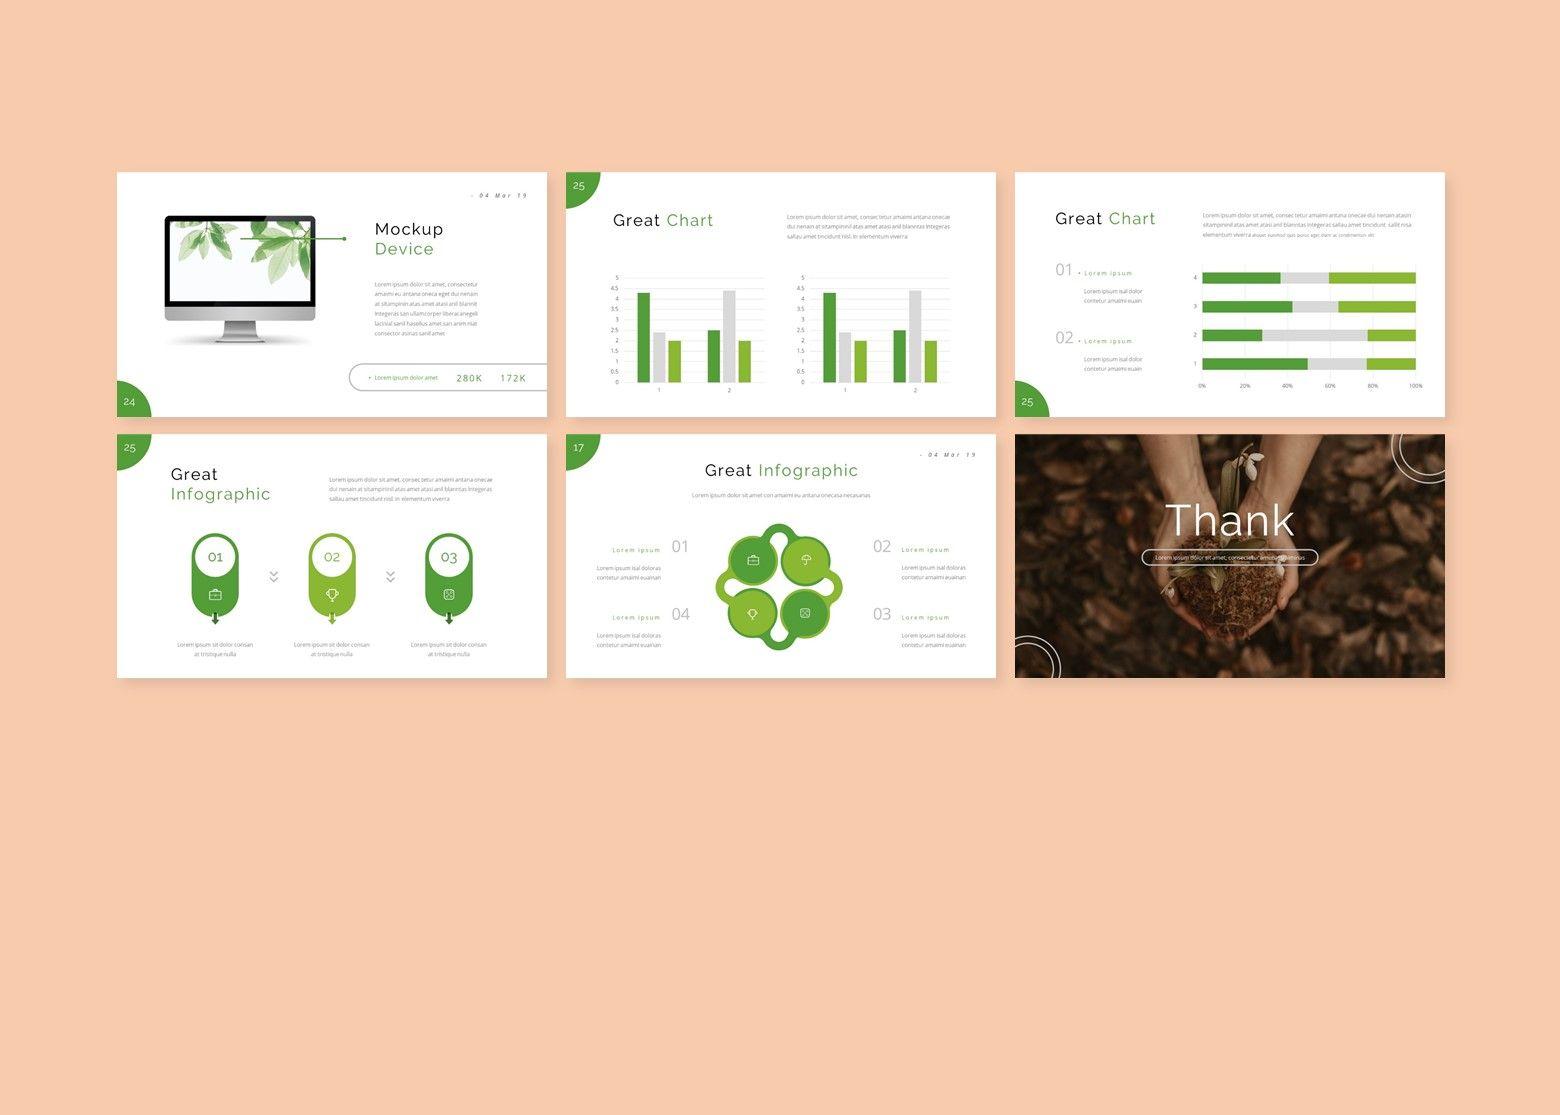 Growi Business Google Slides Template, Slide 5, 08127, Business Models — PoweredTemplate.com